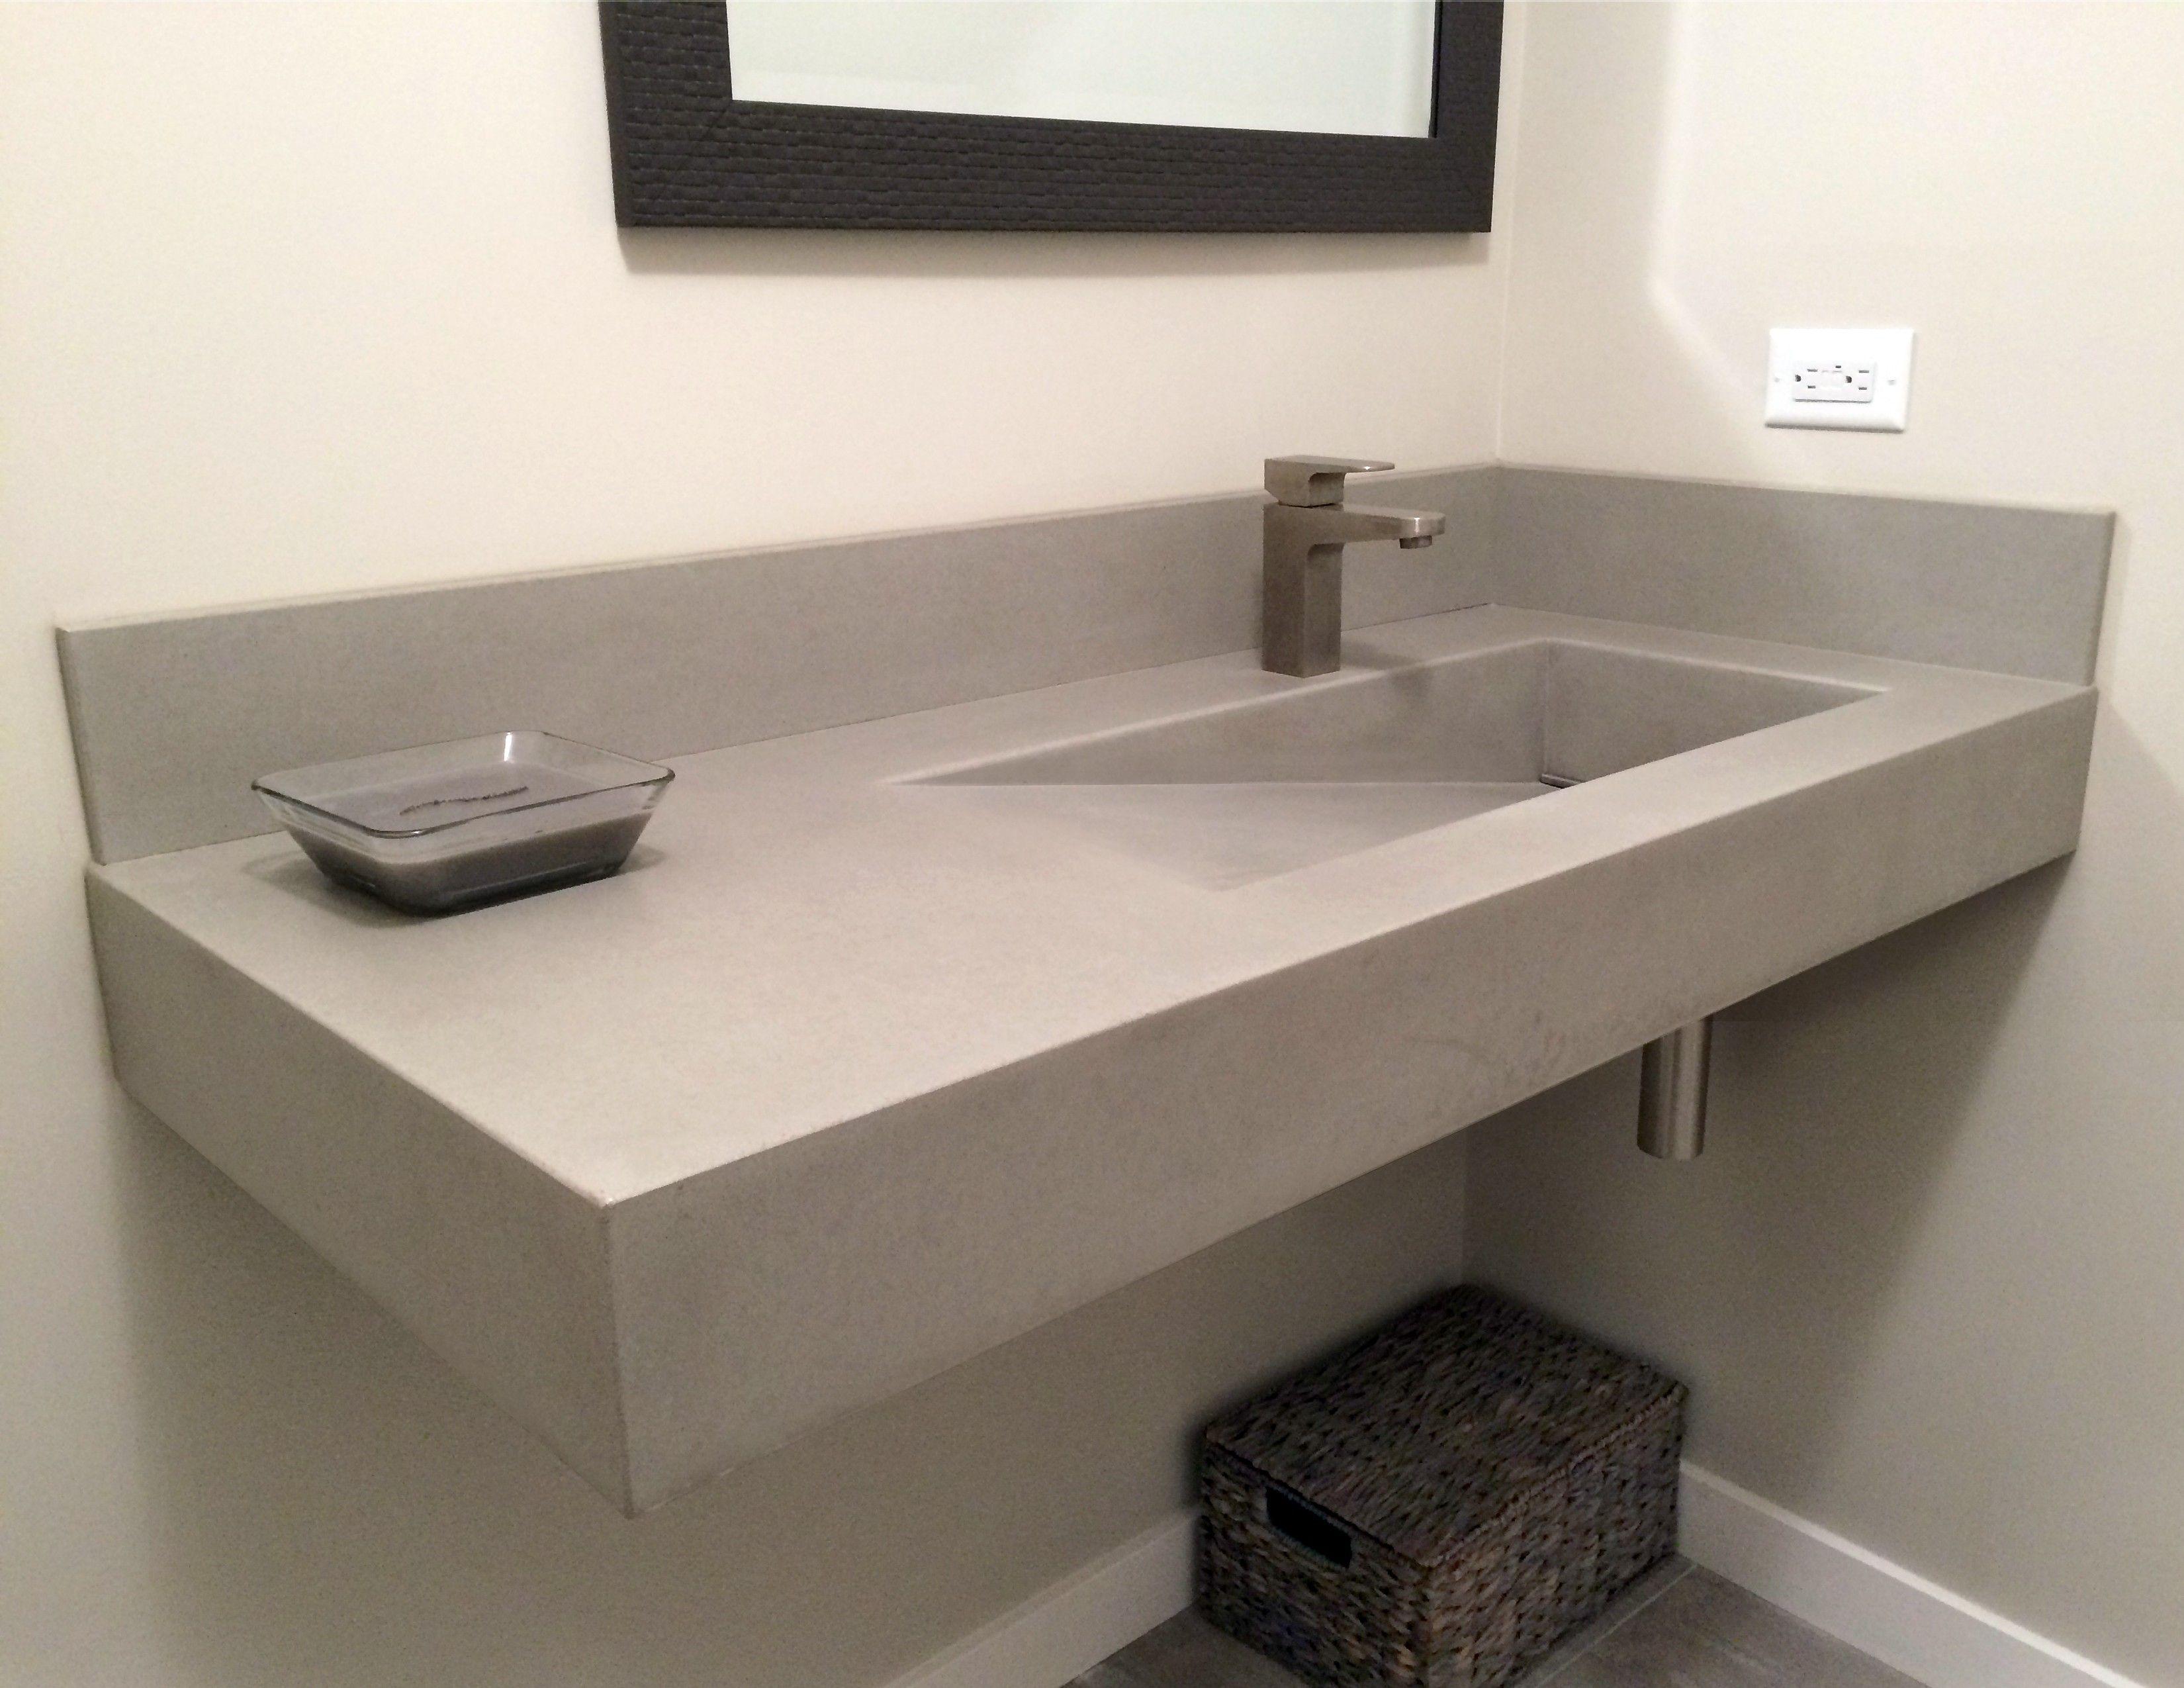 Concrete Kitchen Sink Tile Floors In Mosaic Bathroom Square Google Search